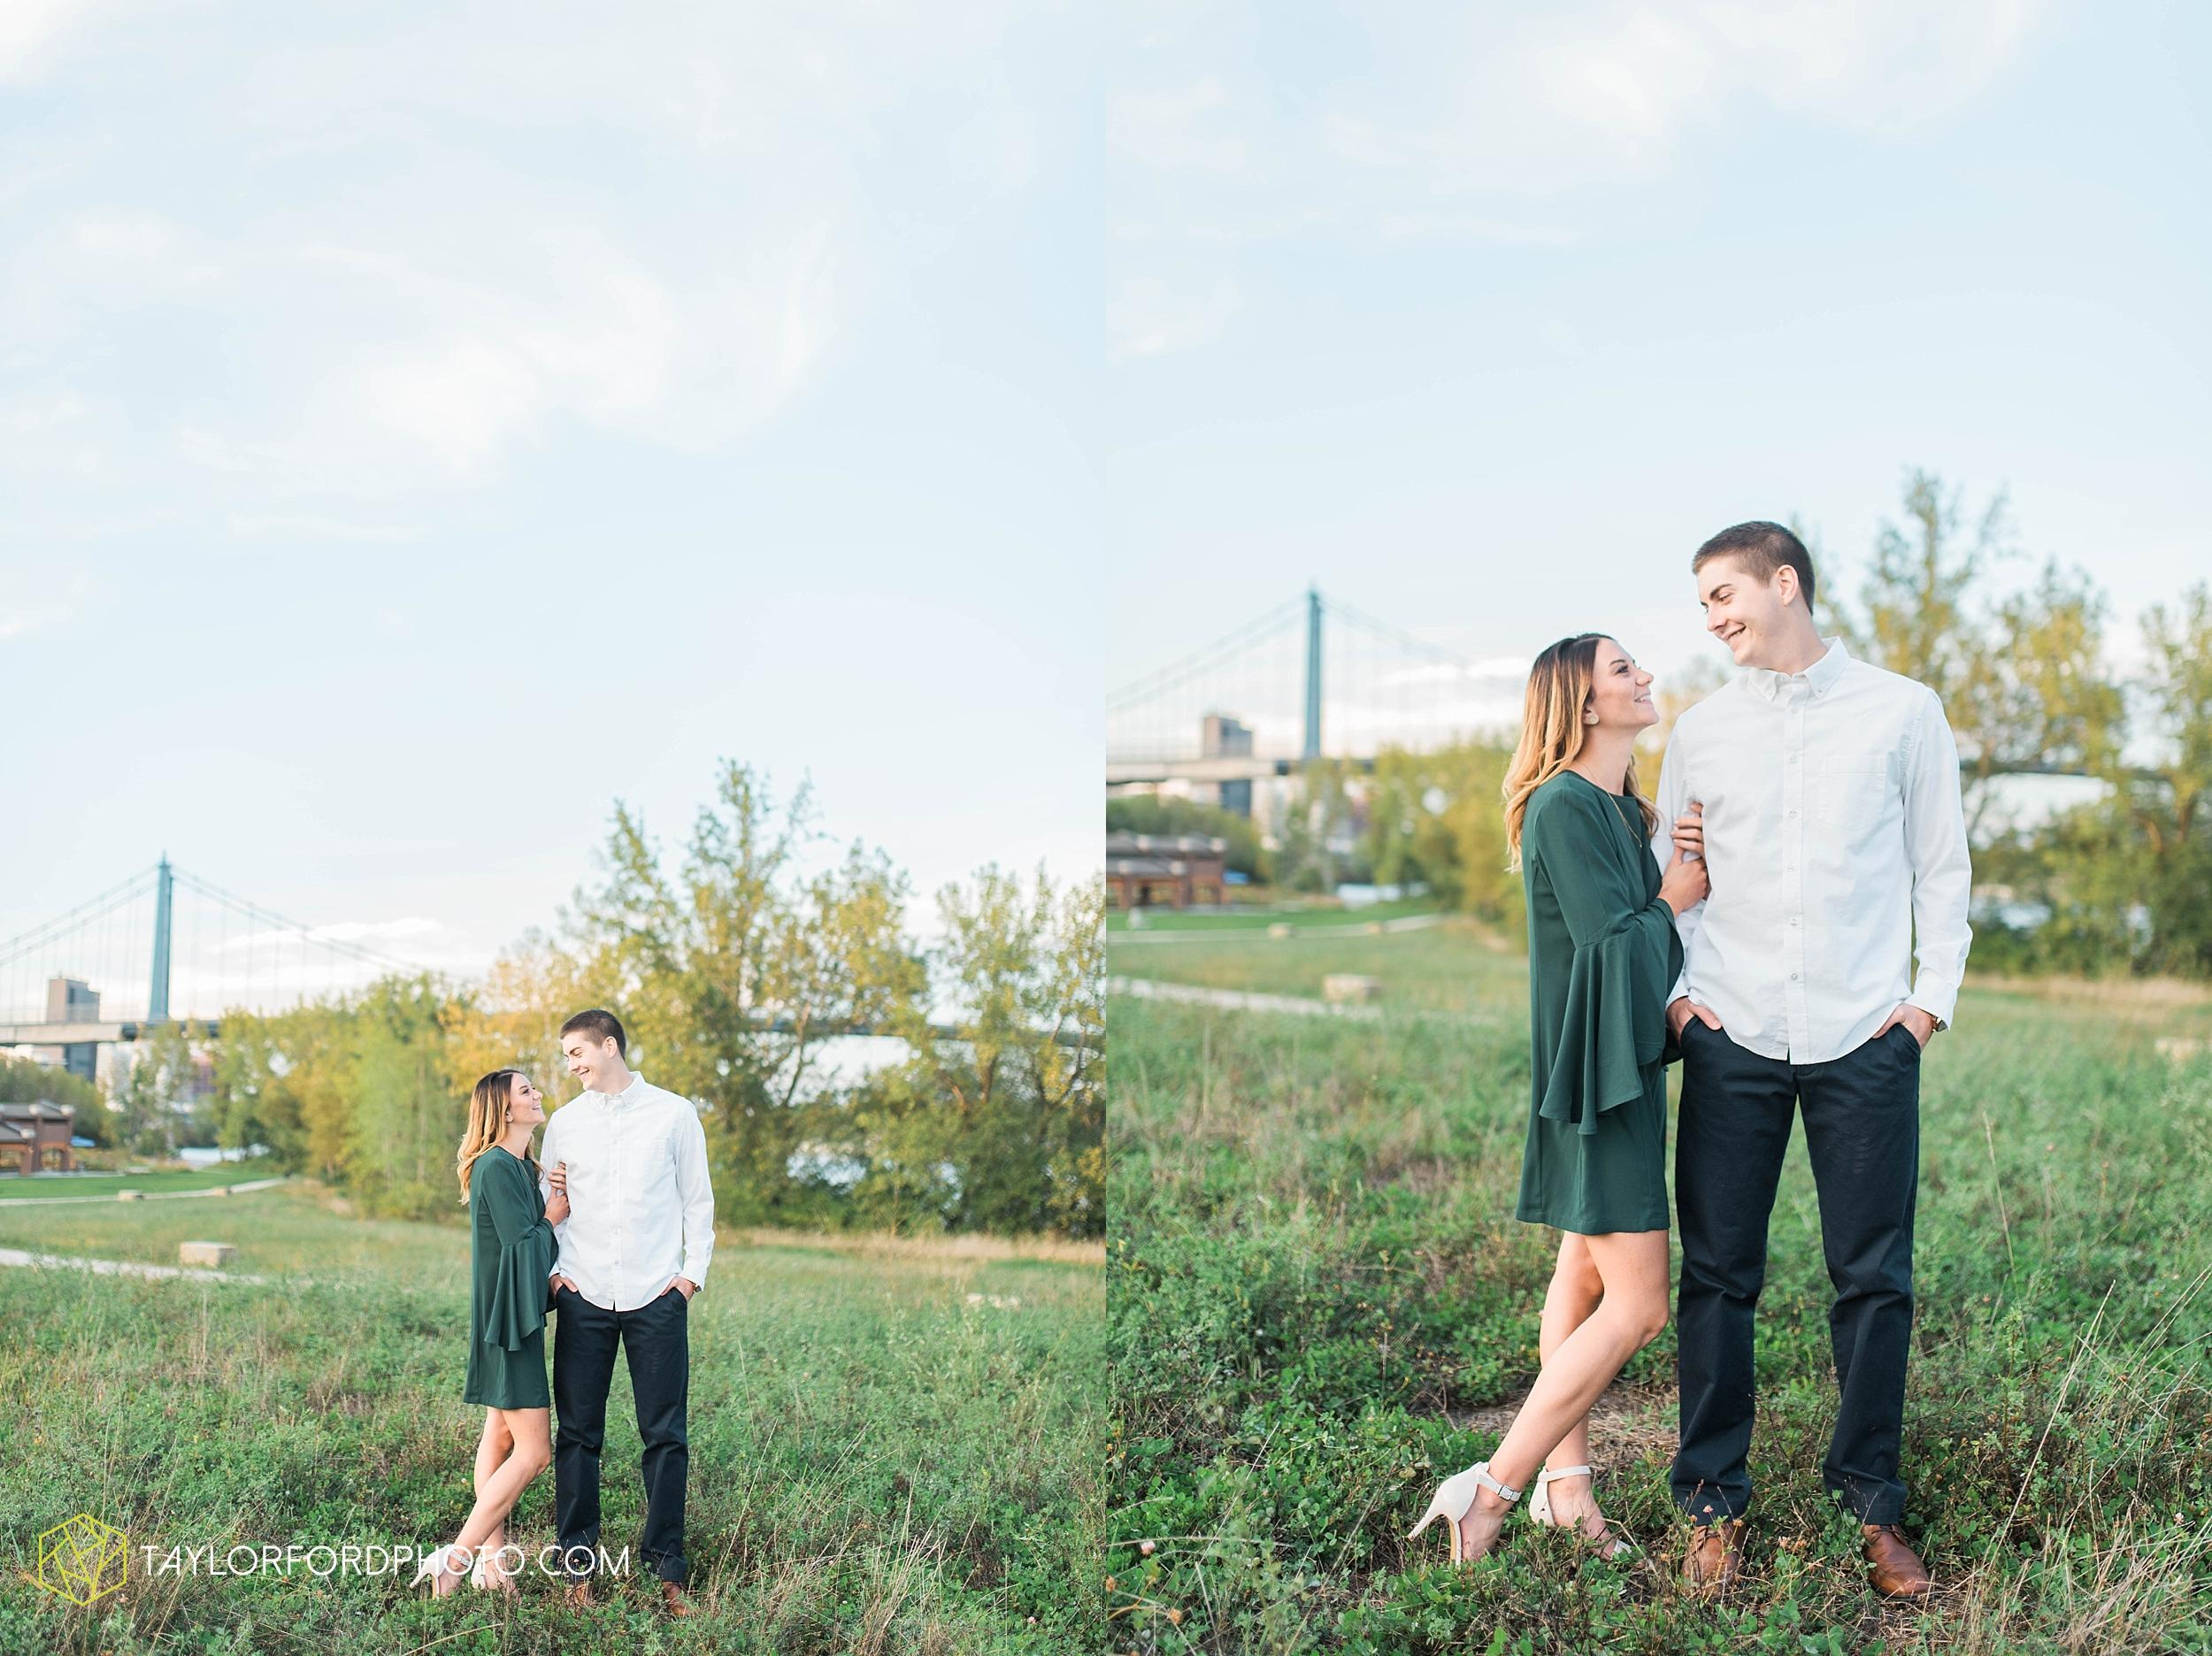 toledo-ohio-engagement-wedding-photographer-Taylor-Ford-Photography-oaks-openings-toledo-metro_3687.jpg